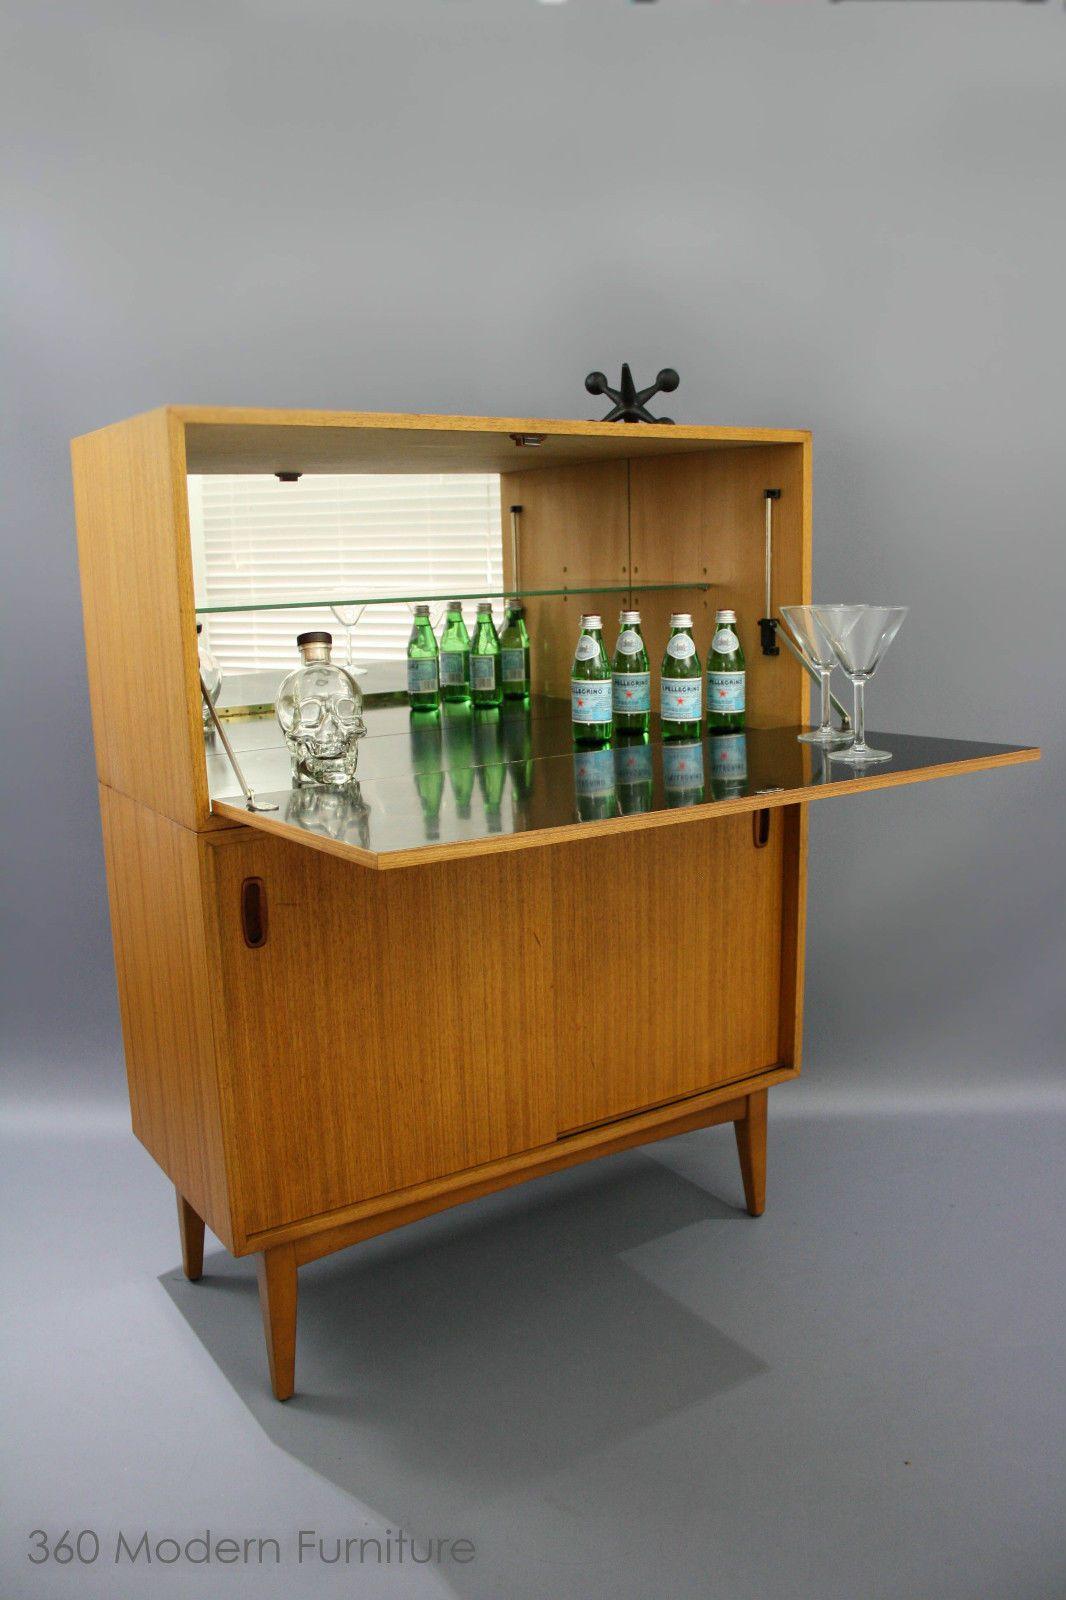 Mid century cocktail bar cabinet vintage retro table console sideboard danish in narre warren vic ebay 360 modern furniture